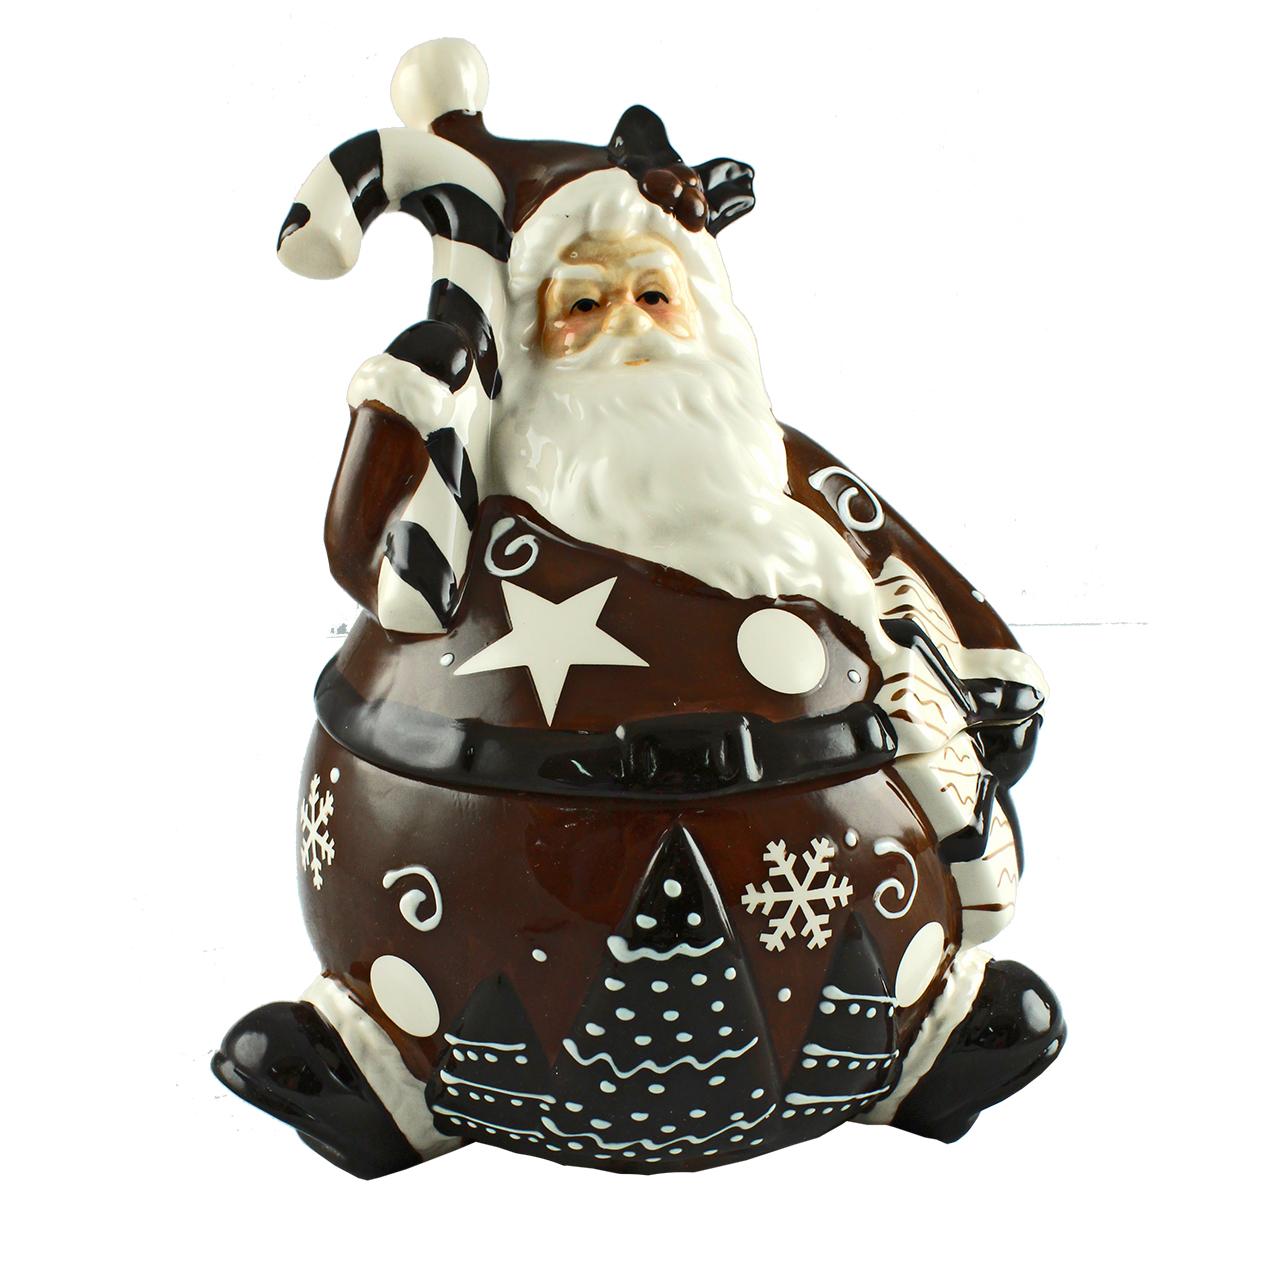 Cutie Decorativa Cu Capac Din Ceramica Maro